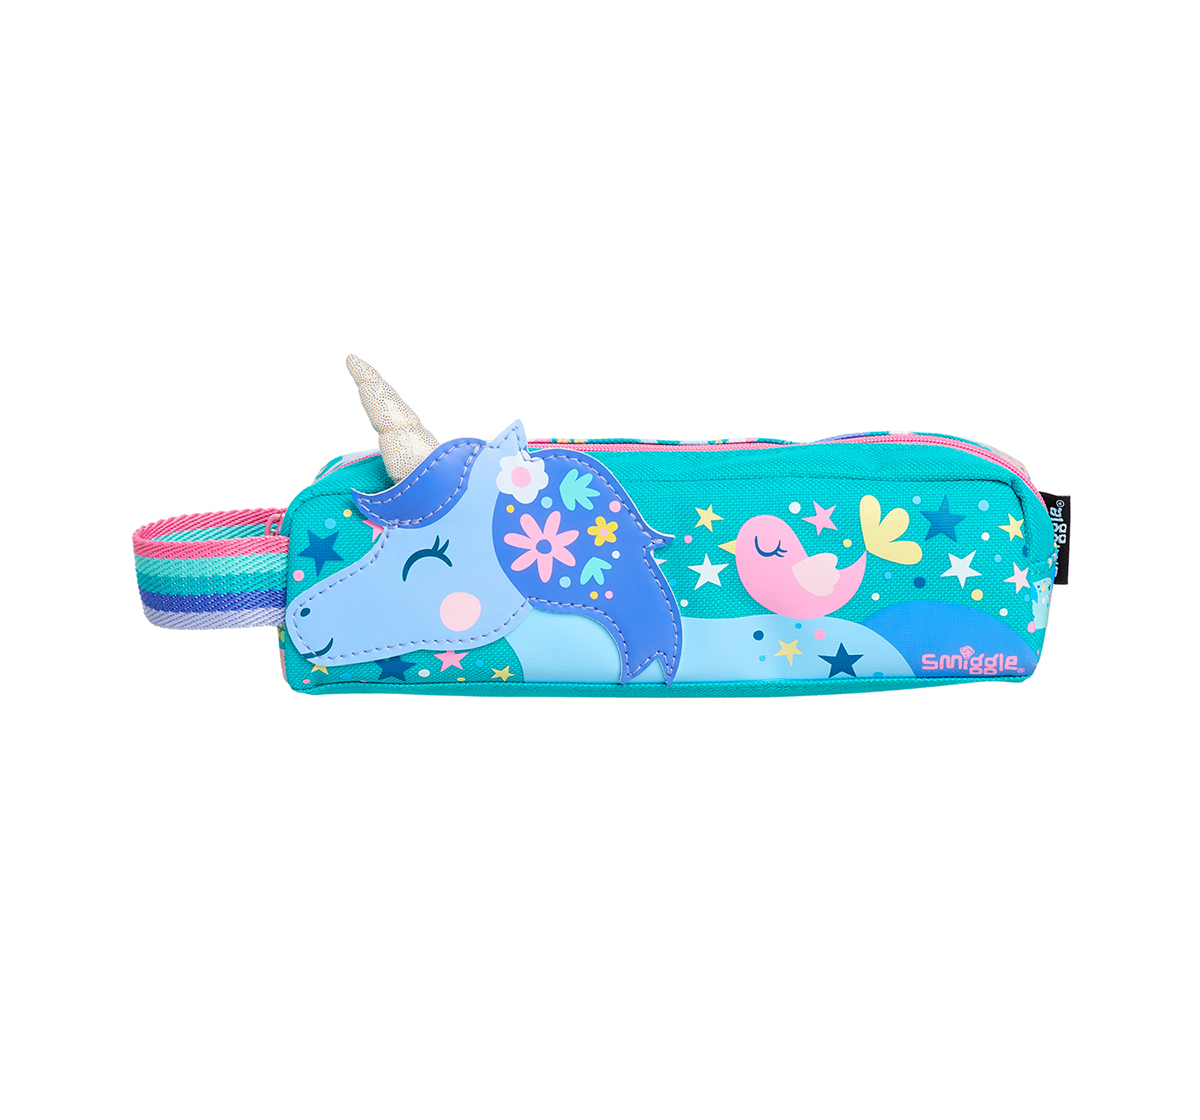 Smiggle    Smiggle Topsy Teeny Tiny Pencil Case - Unicorn Print Bags for Kids age 3Y+ (Aqua)